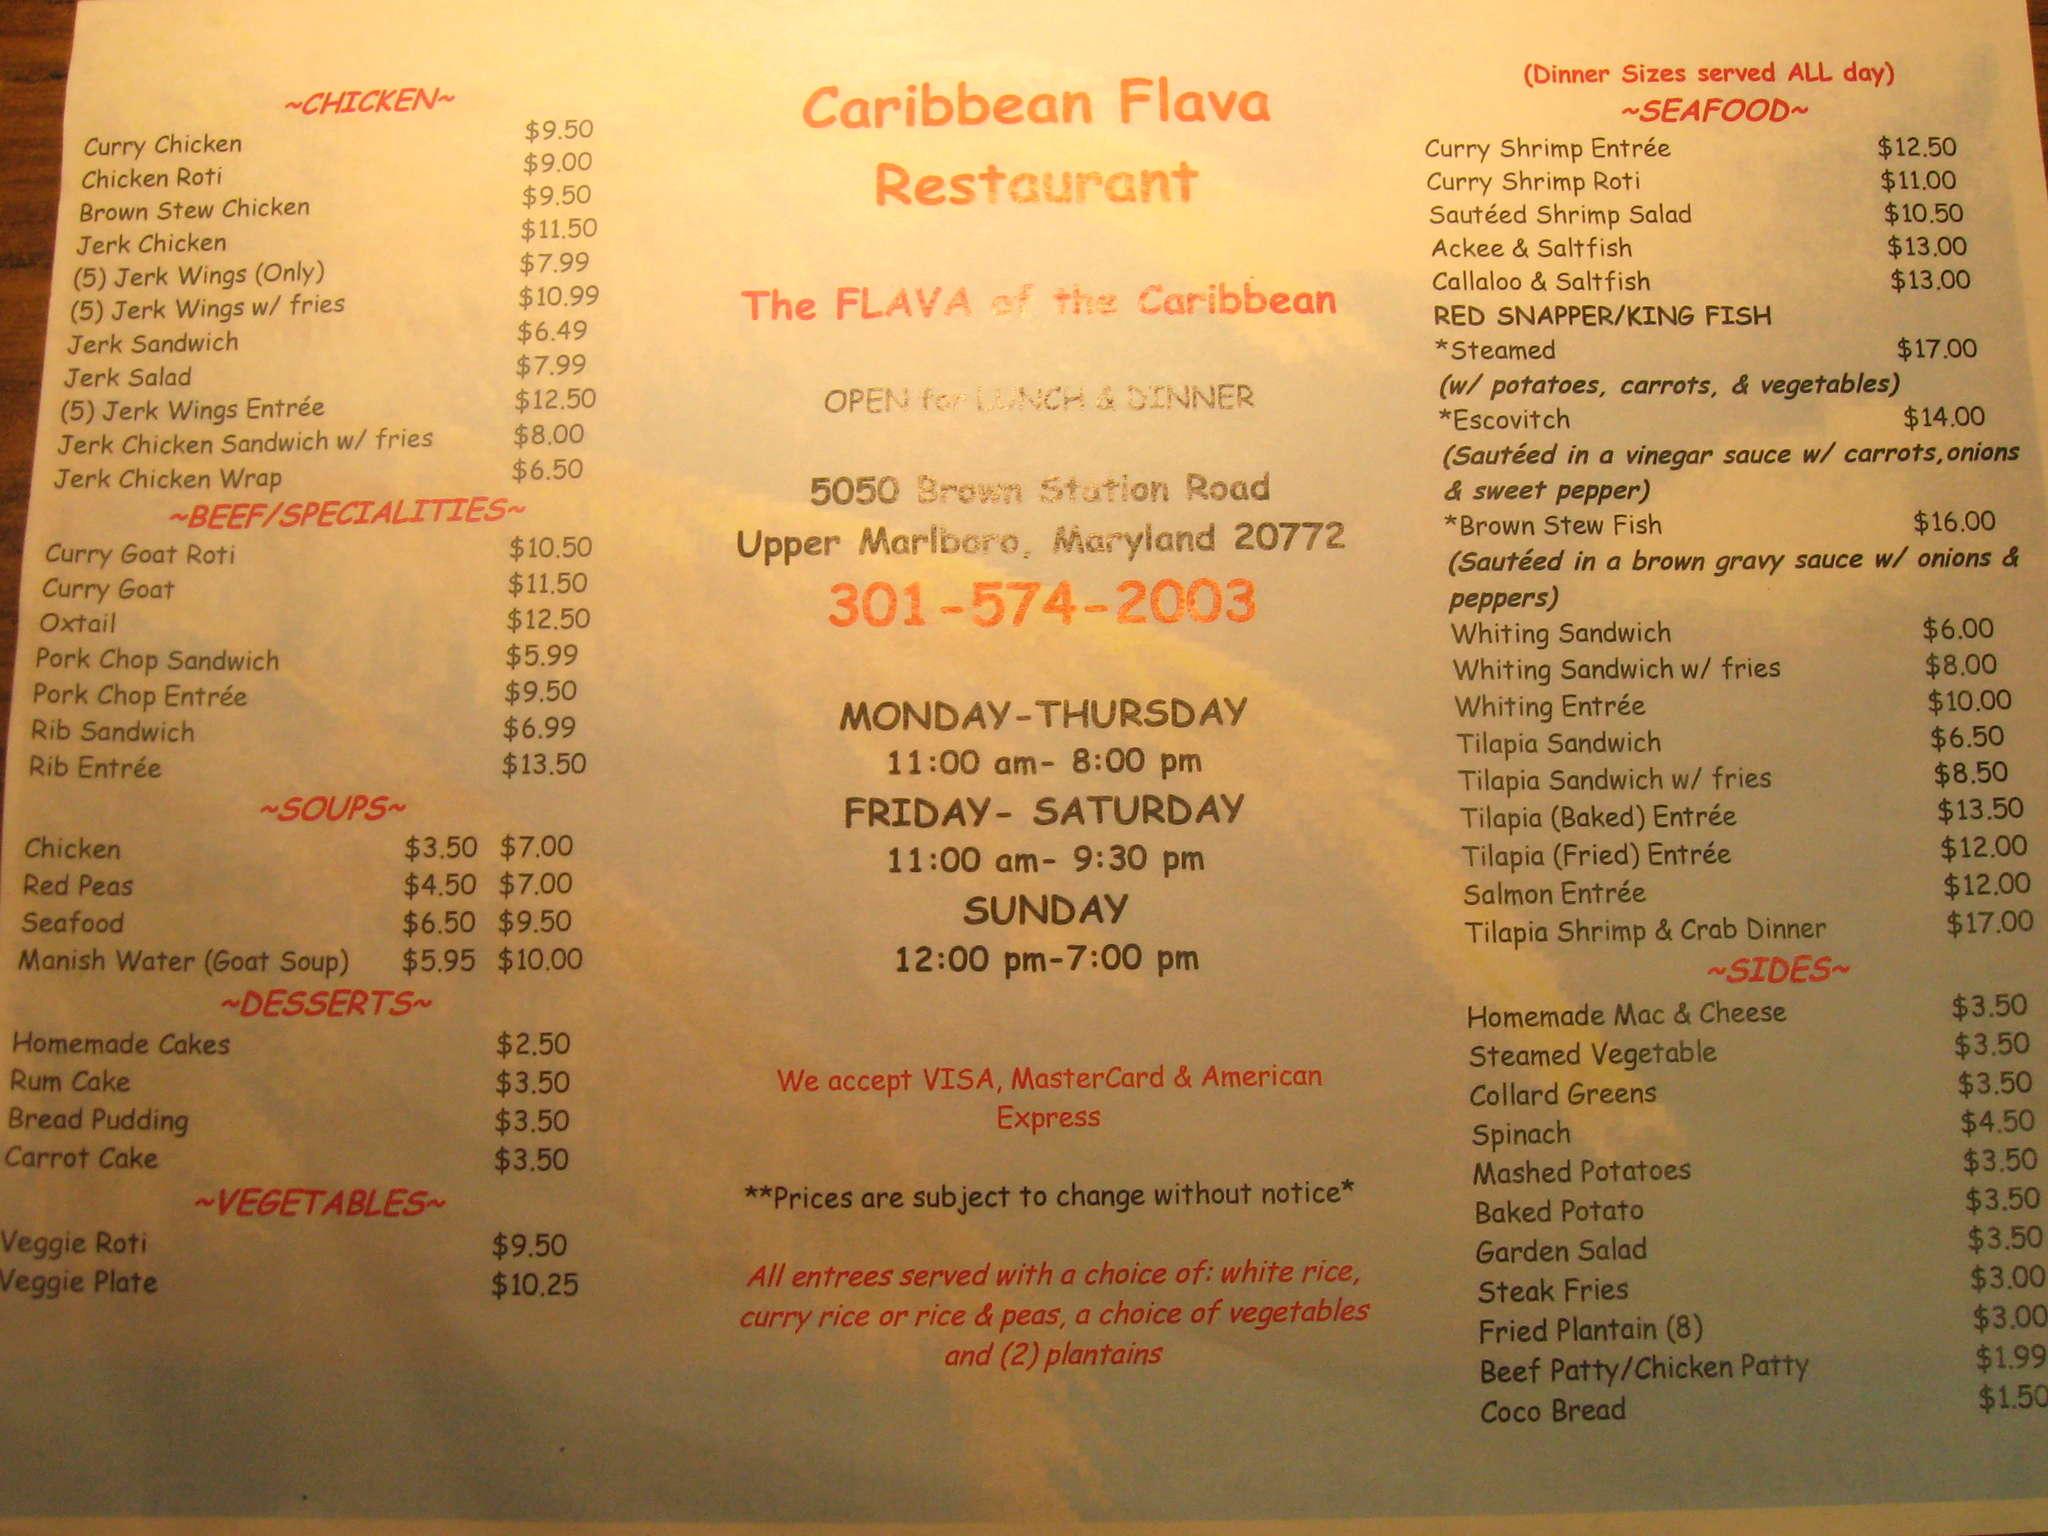 Caribbean Flava